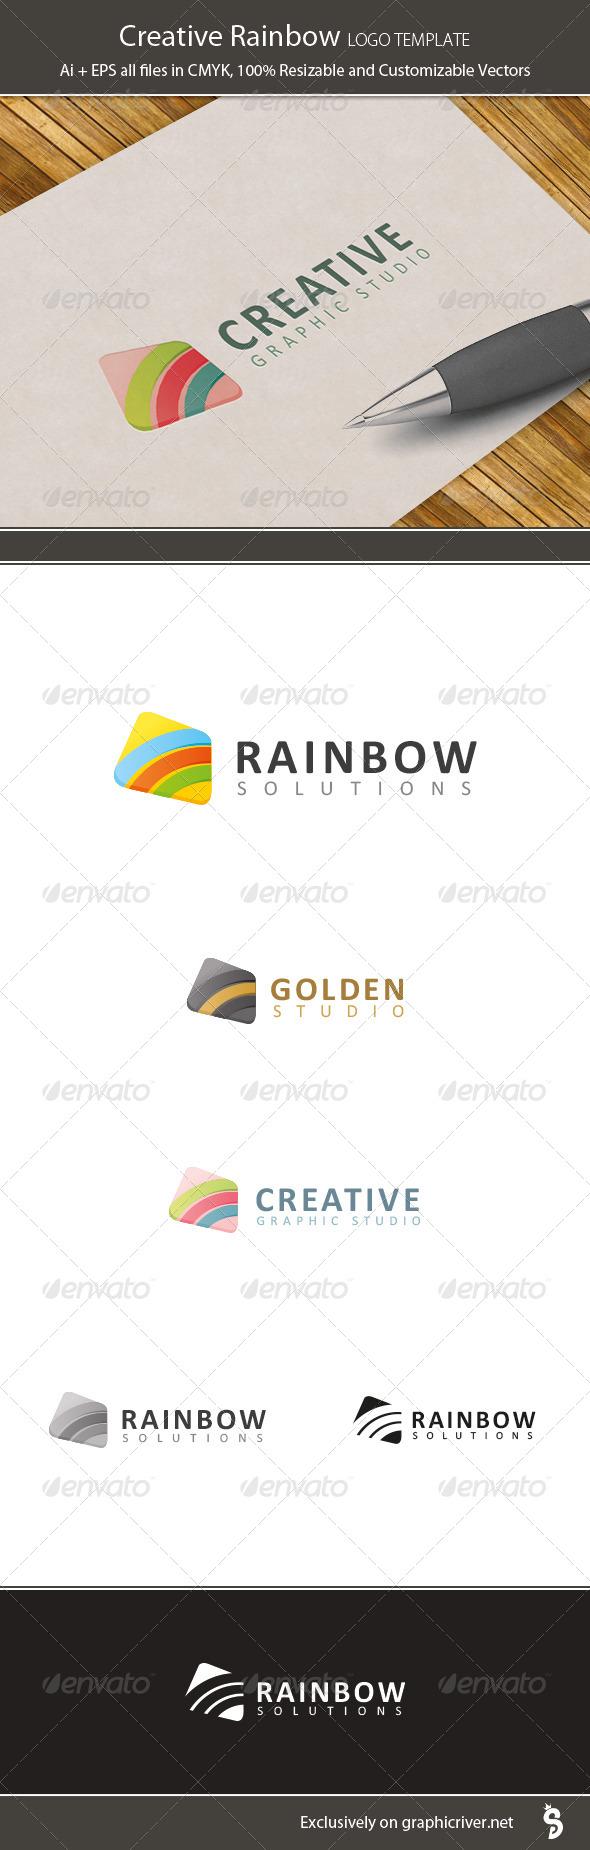 Creative Rainbow Logo Template - Vector Abstract